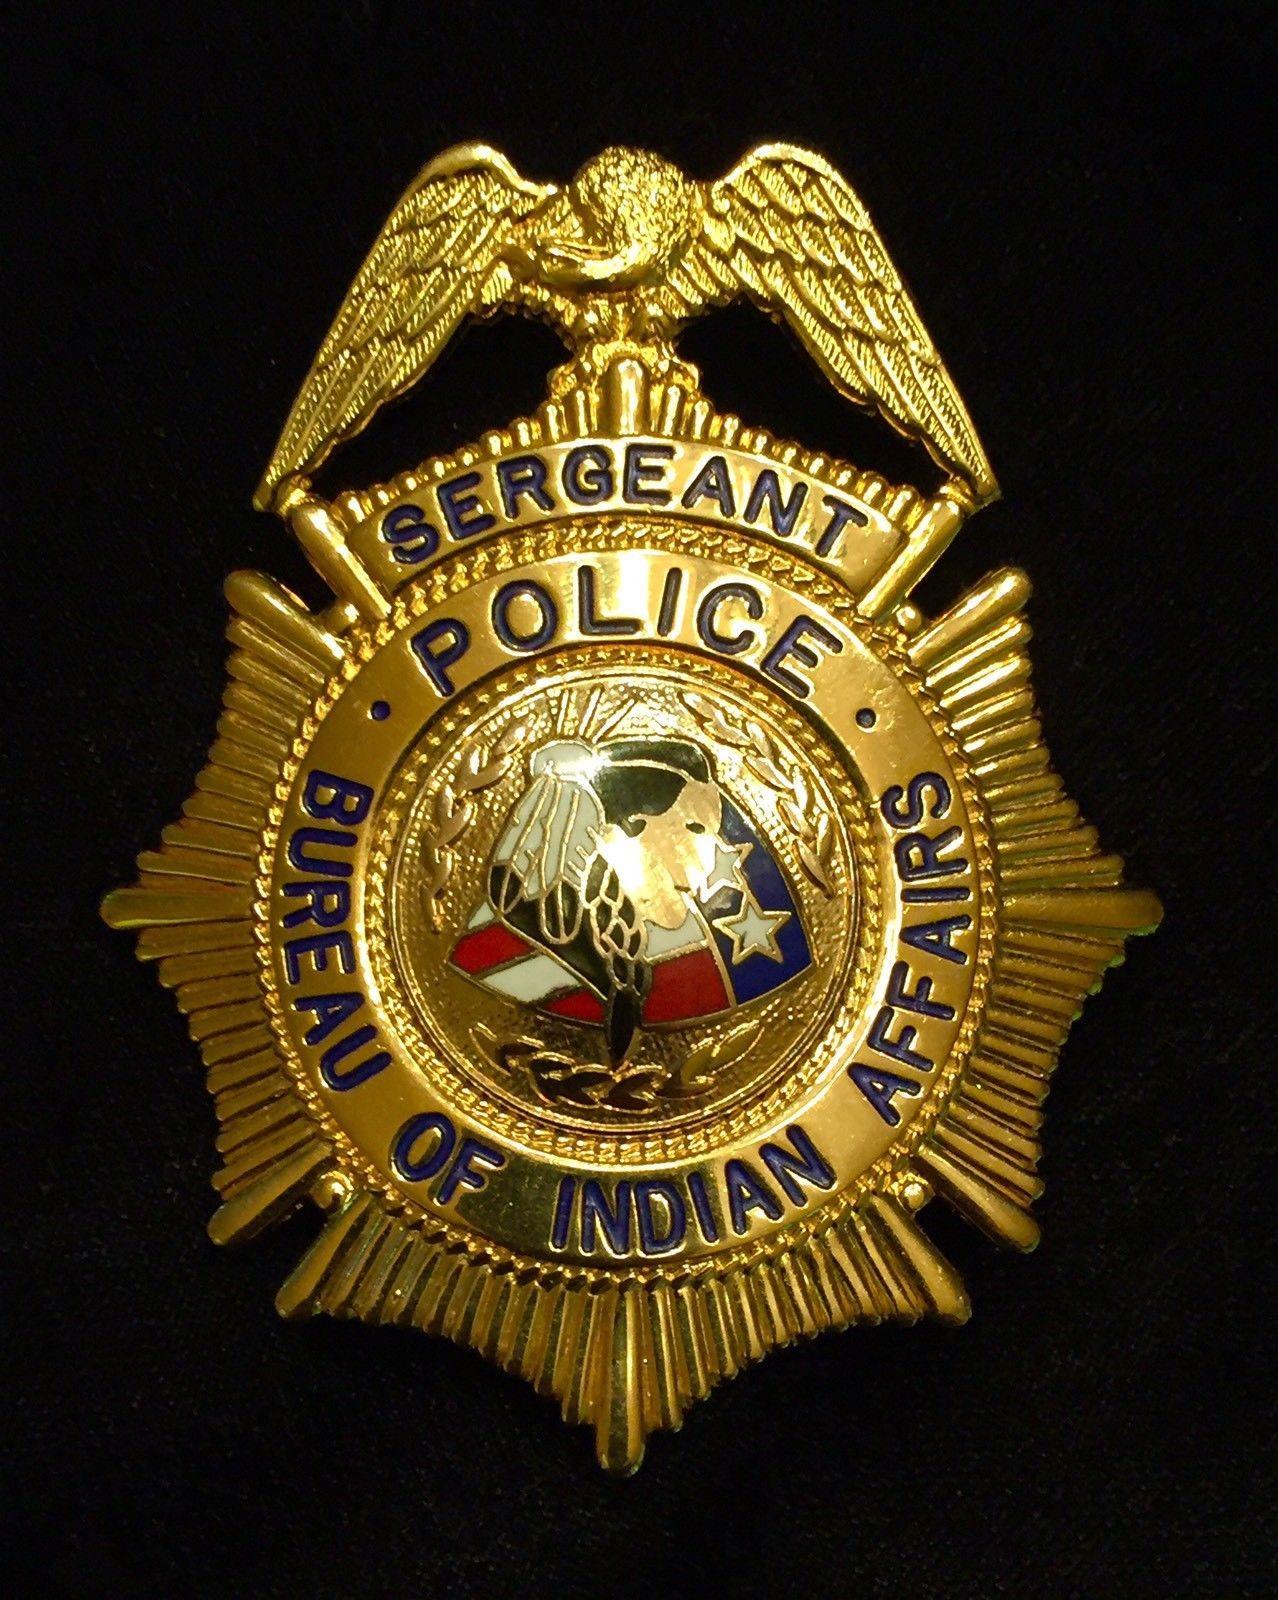 Police Sergeant Bureau Of Indian Affairs Police Badge Indian Police Service Indian Police